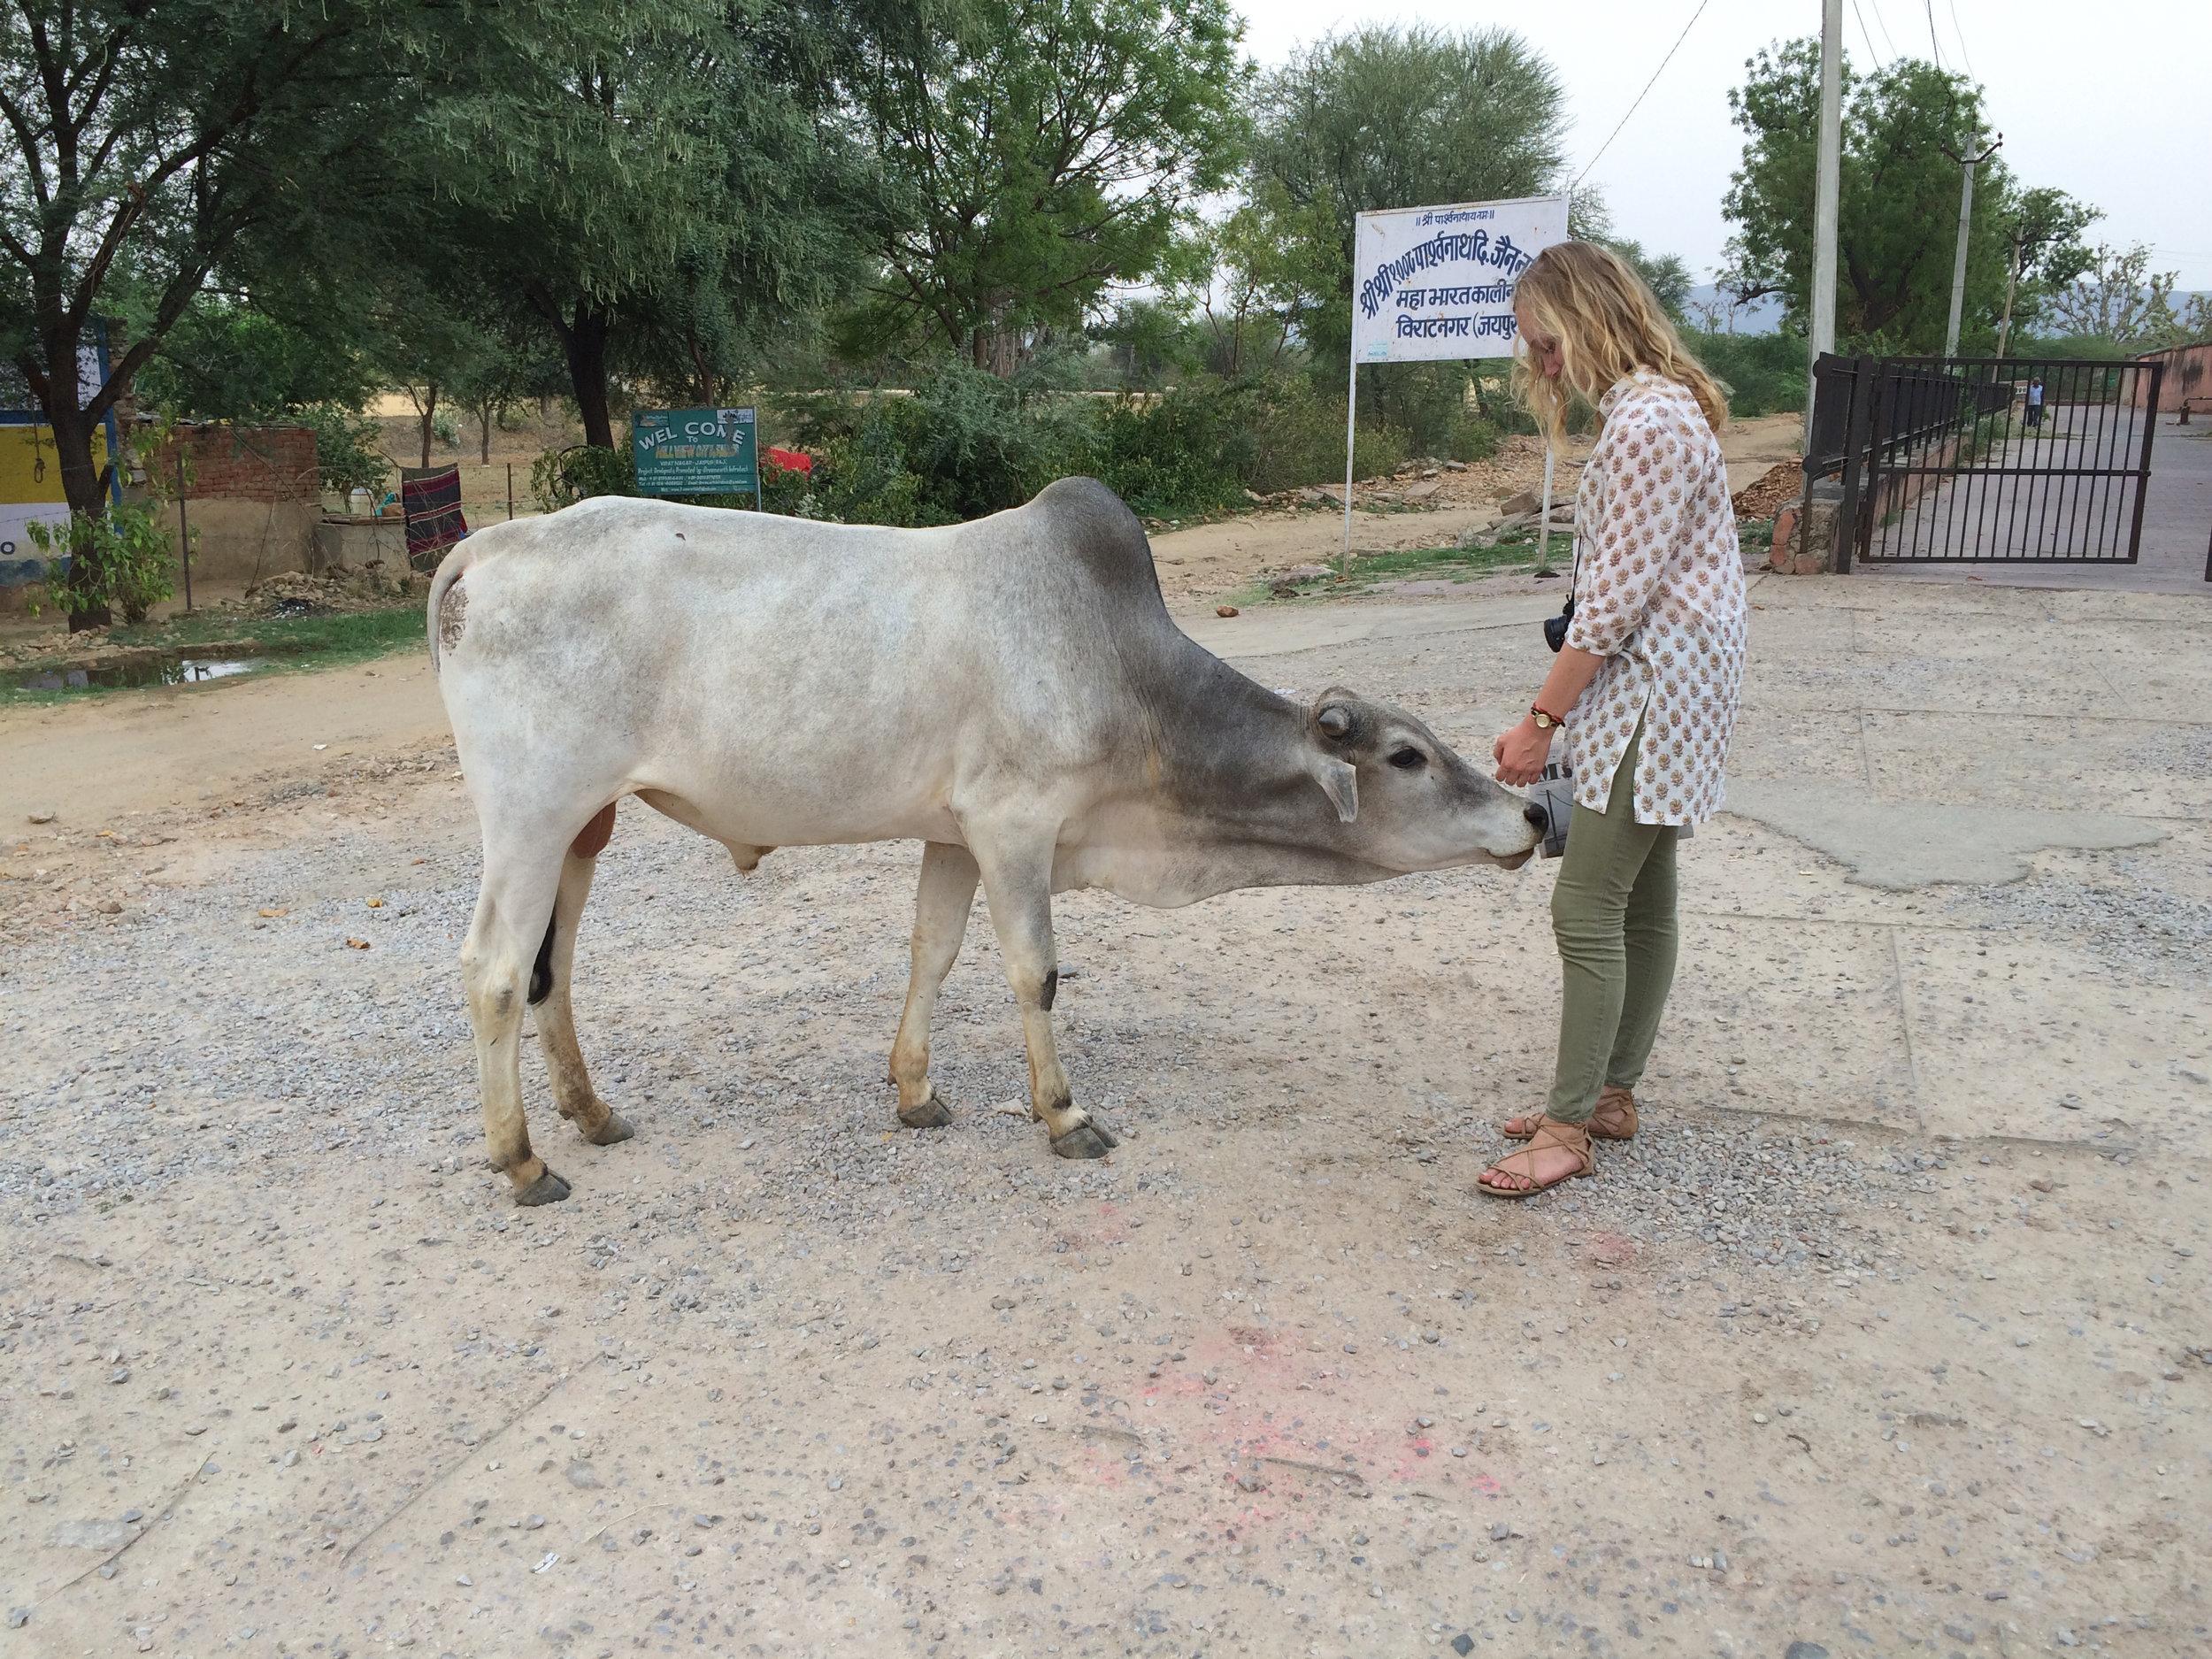 Sophia with the bull